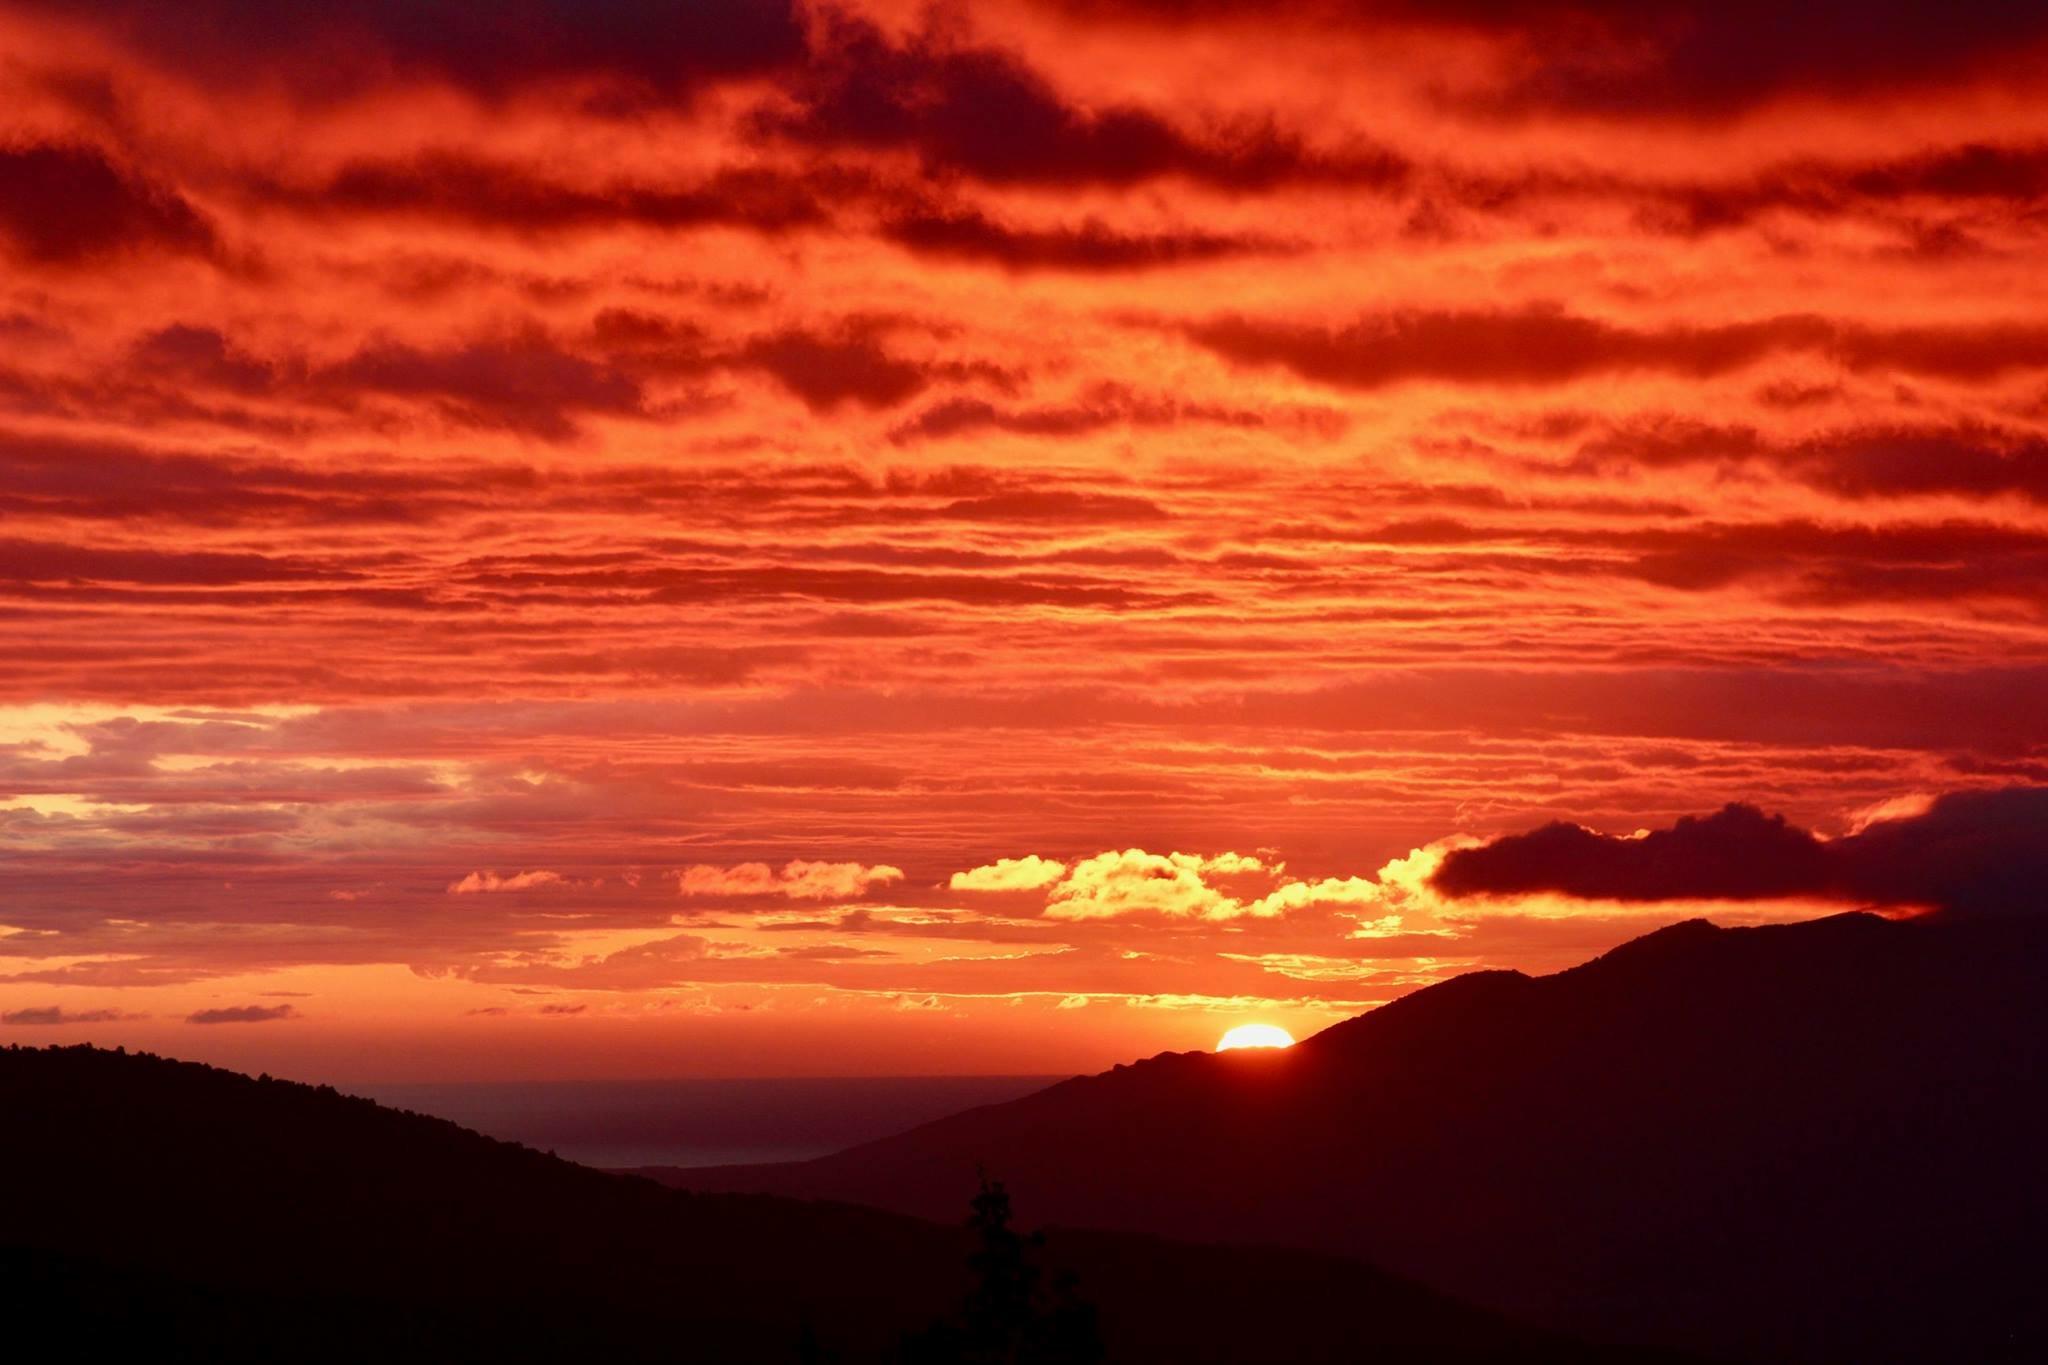 A typical Autumn sunrise at La Taillede